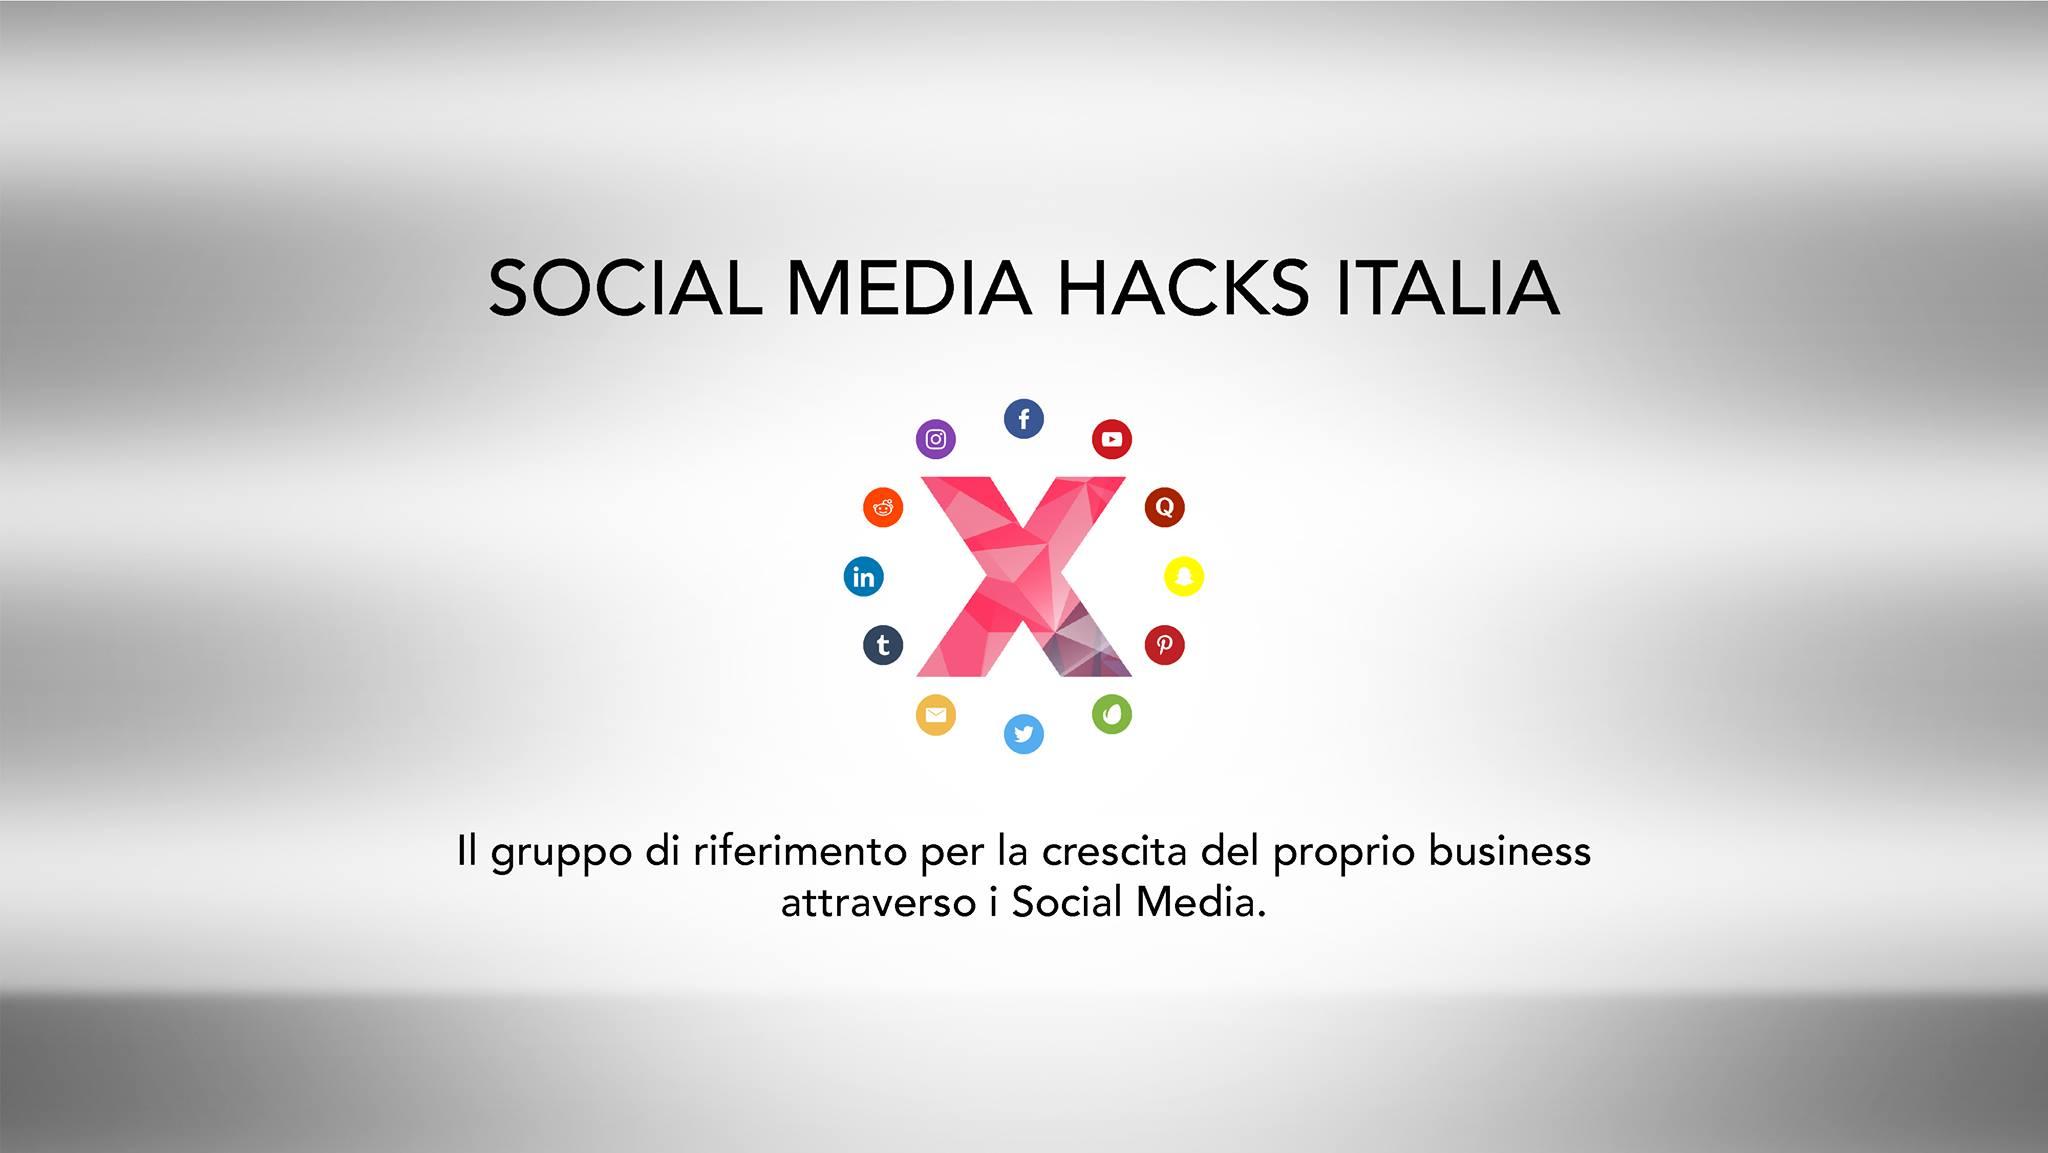 Social media hacks italia